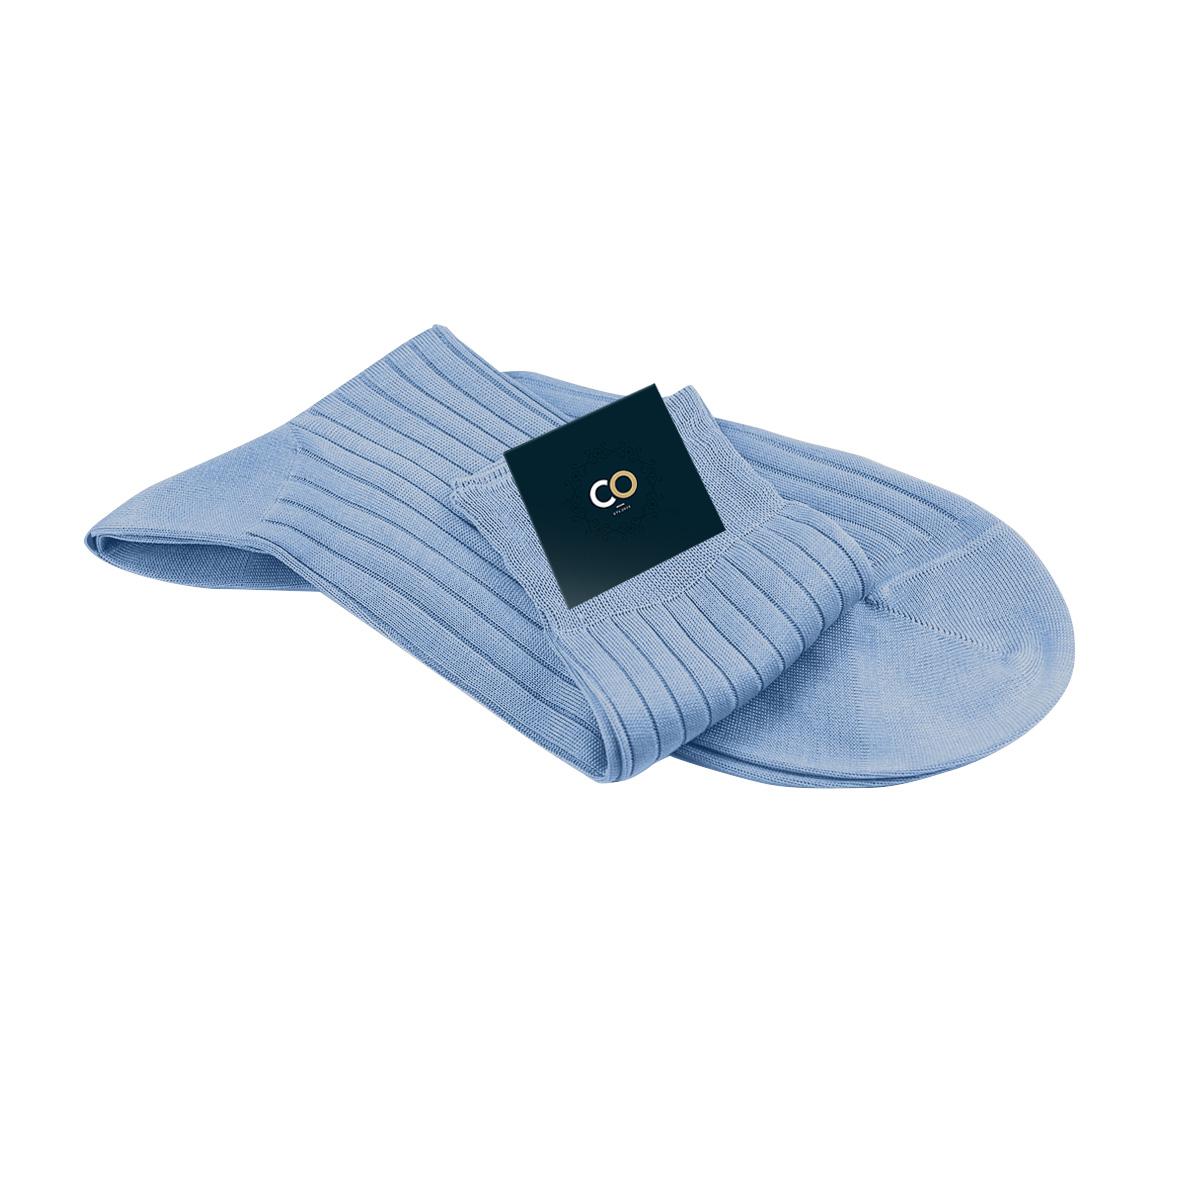 Chaussette Briac, Bleu layette